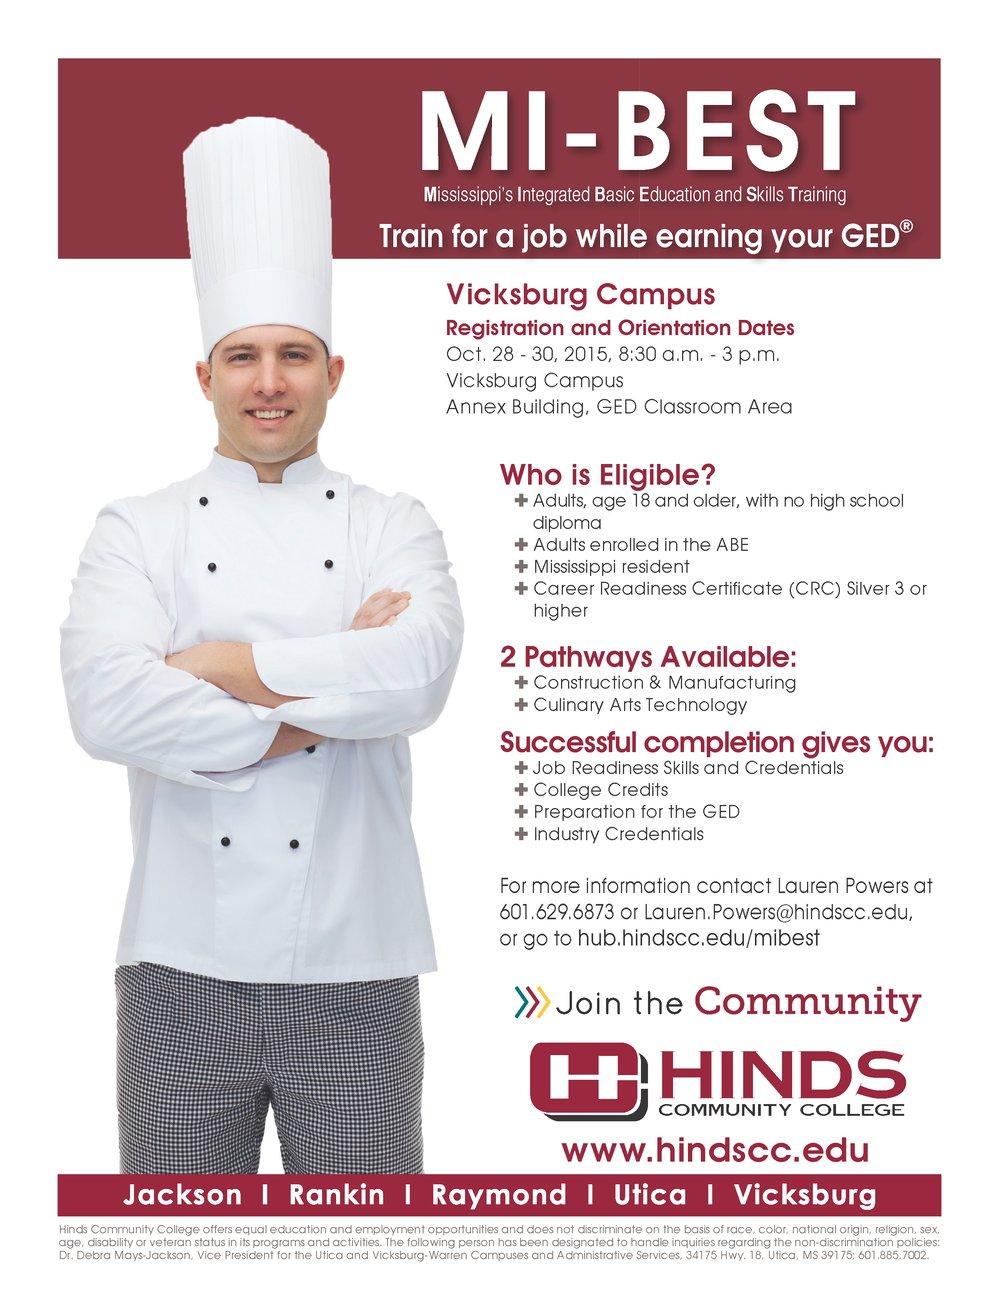 Mi-BEST_Flyer_FL15-Culinary3-1